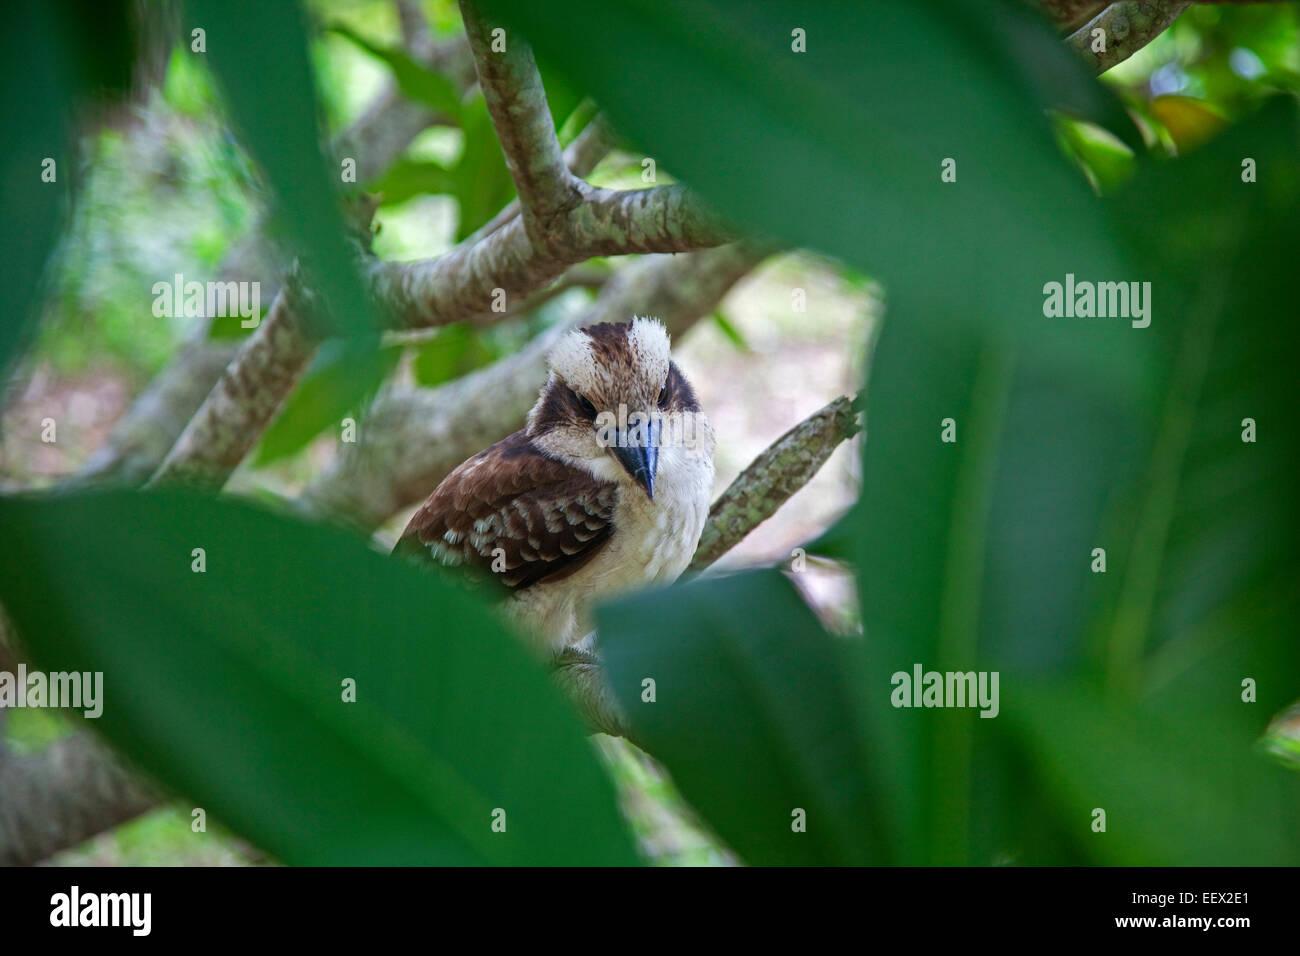 Laughing kookaburra (Dacelo novaeguineae) perched in tree, Queensland, Australia - Stock Image